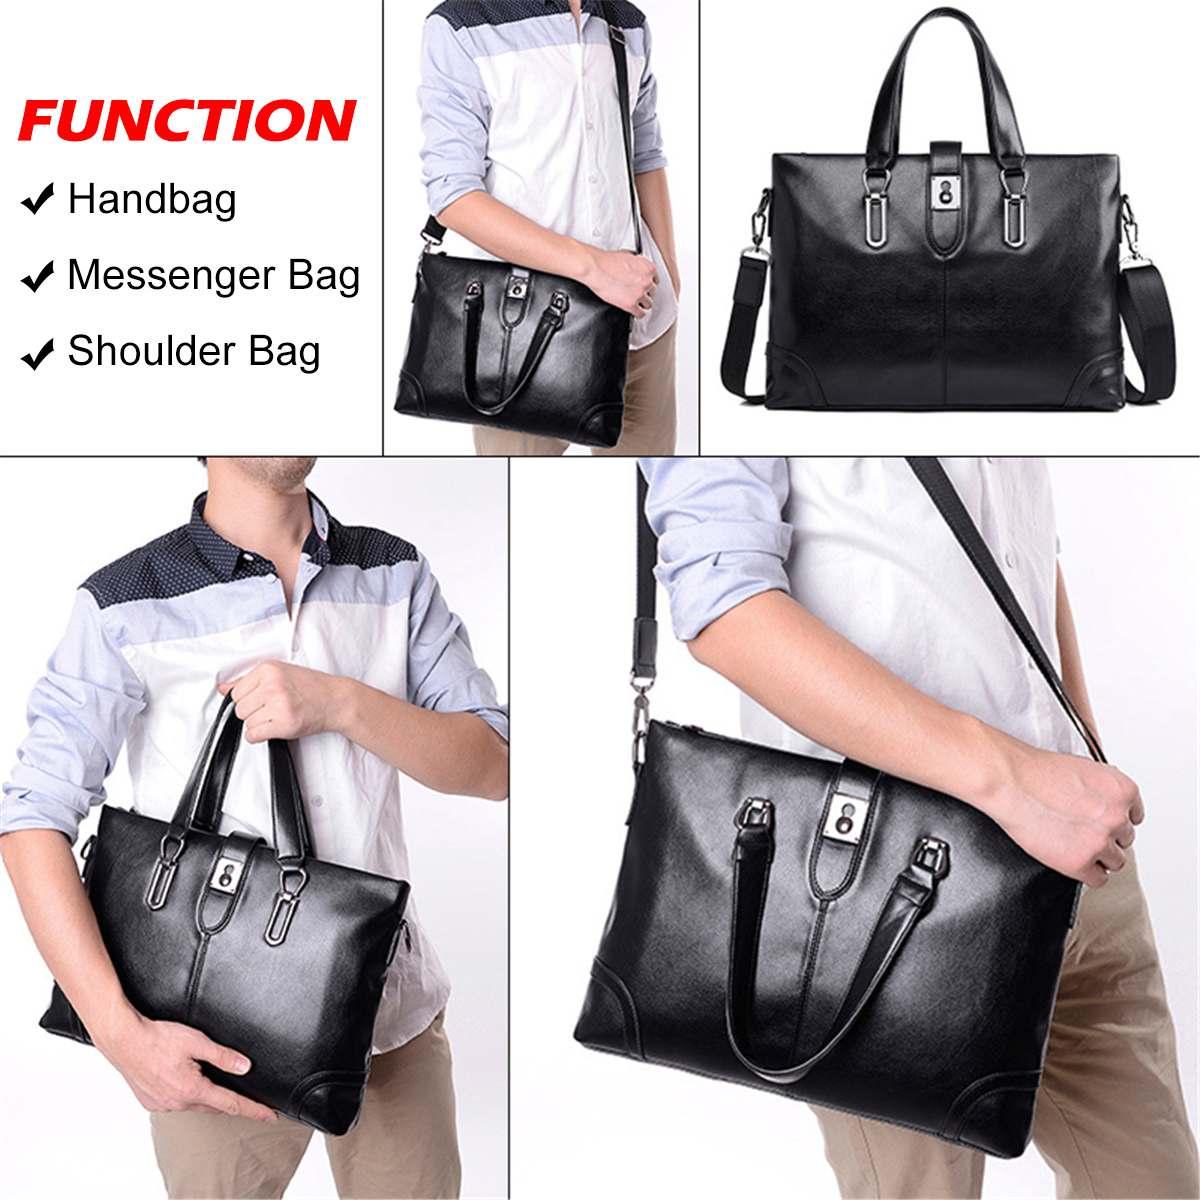 Retro Men PU Leather Black Briefcase Business Handbags Messenger Bags  Large Capacity Male Vintage Shoulder Bag For Laptop